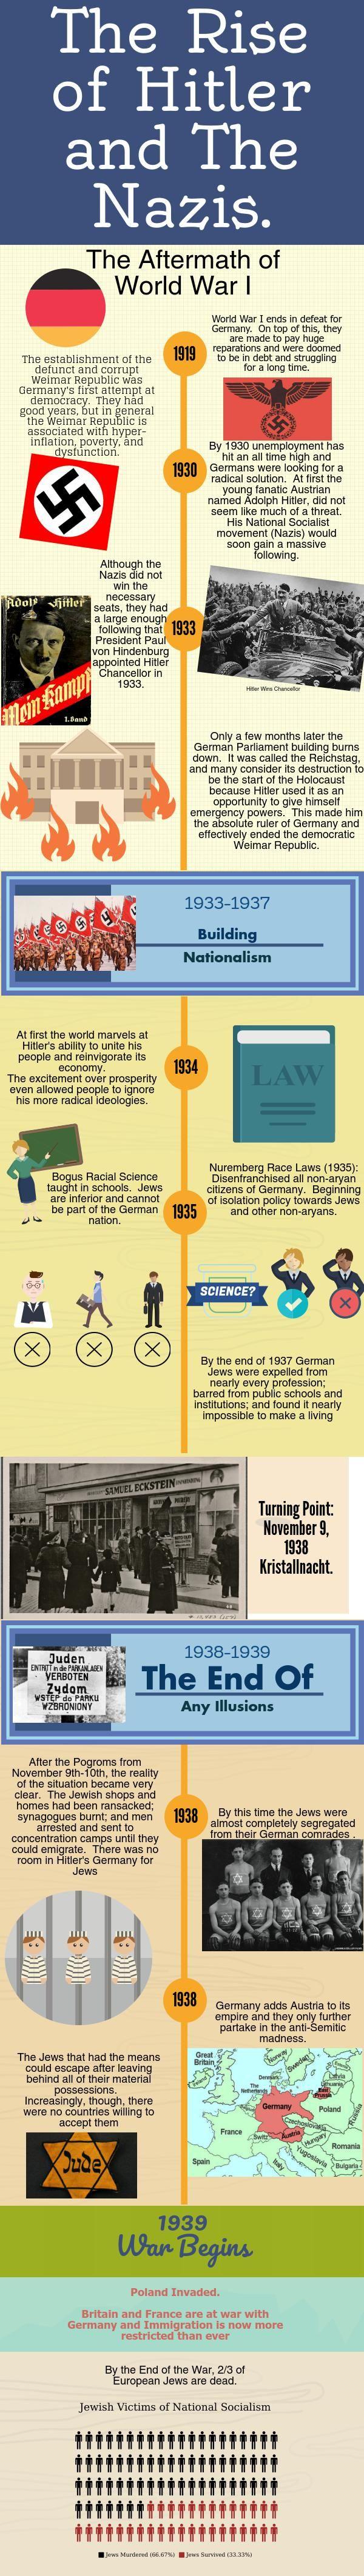 The Holocaust: Beginnings.   @Piktochart Infographic